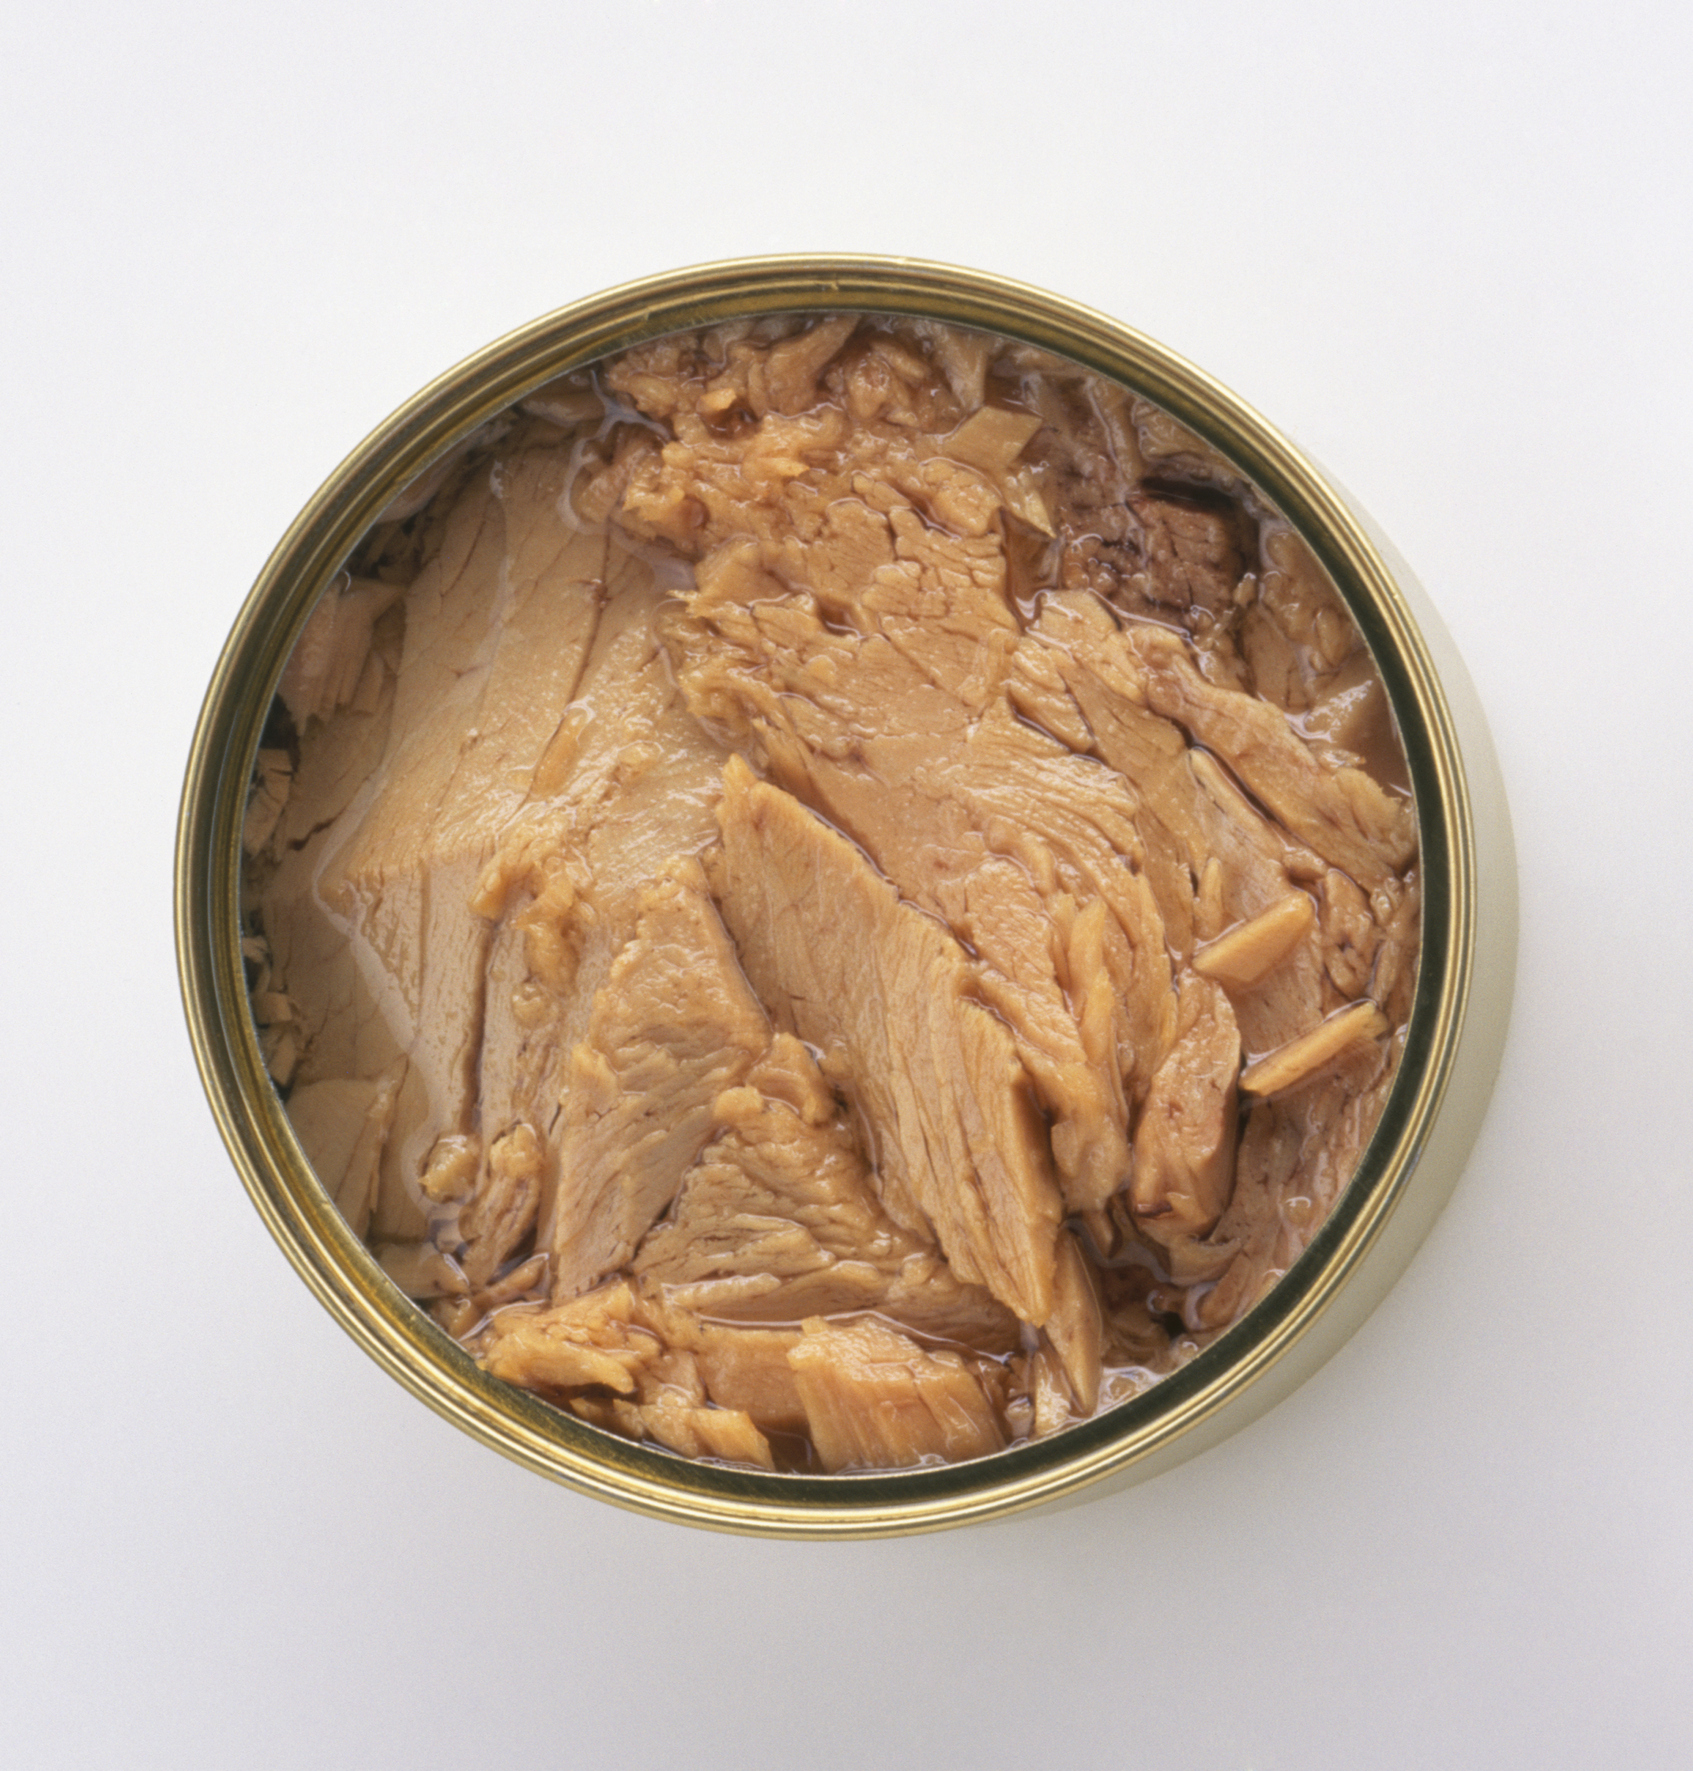 getty-canned-tuna-image